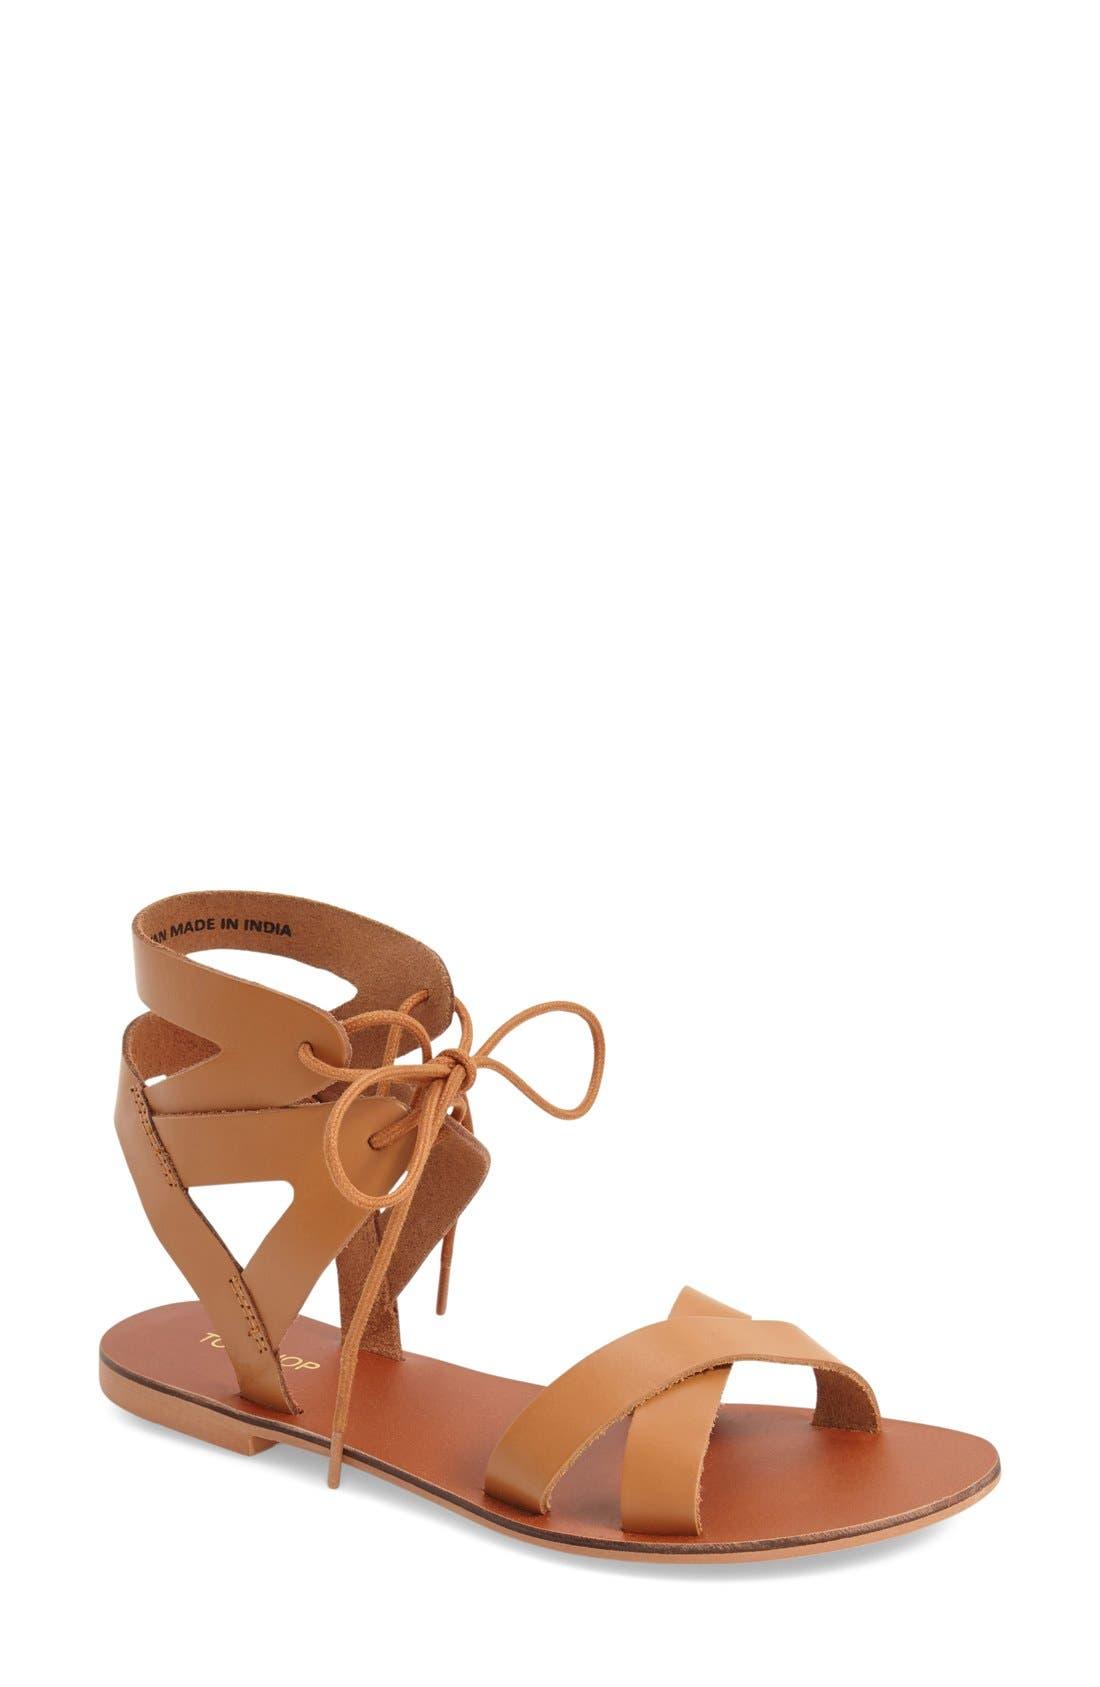 'Herb' Lace-Up Flat Sandal,                             Main thumbnail 1, color,